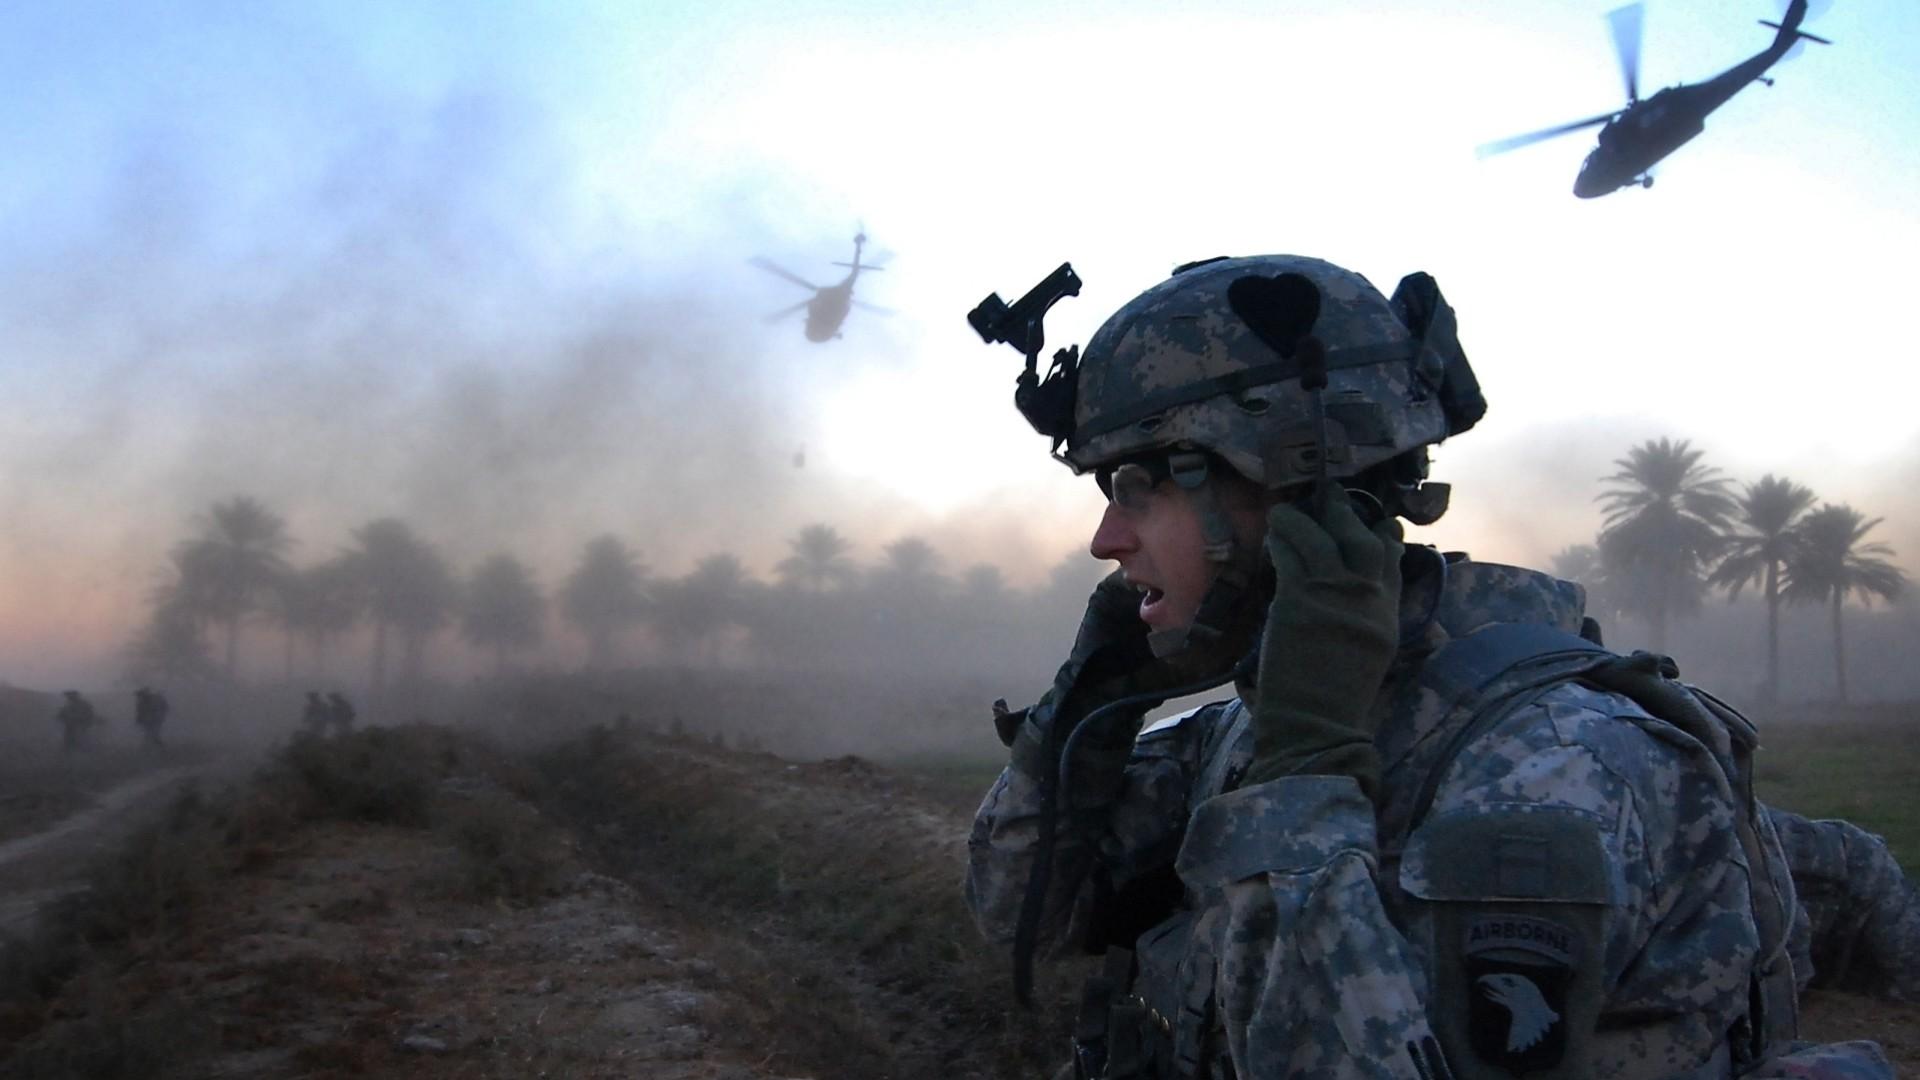 Military Backgrounds for Computer | Desktop Image